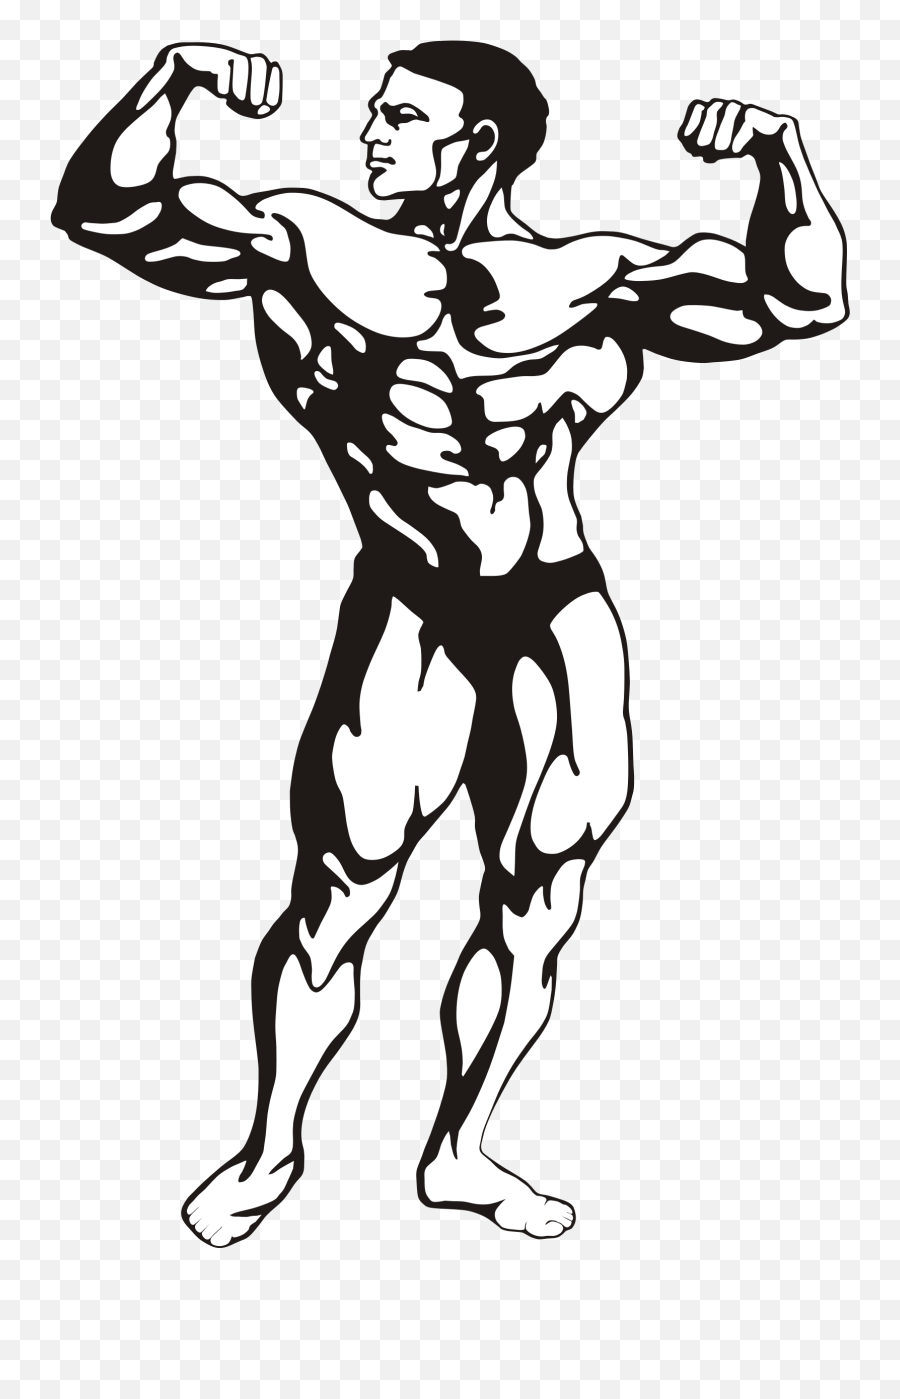 Fitness Model Vector File Image - Body Builder Clip Art Emoji,Apple Gun Emoji